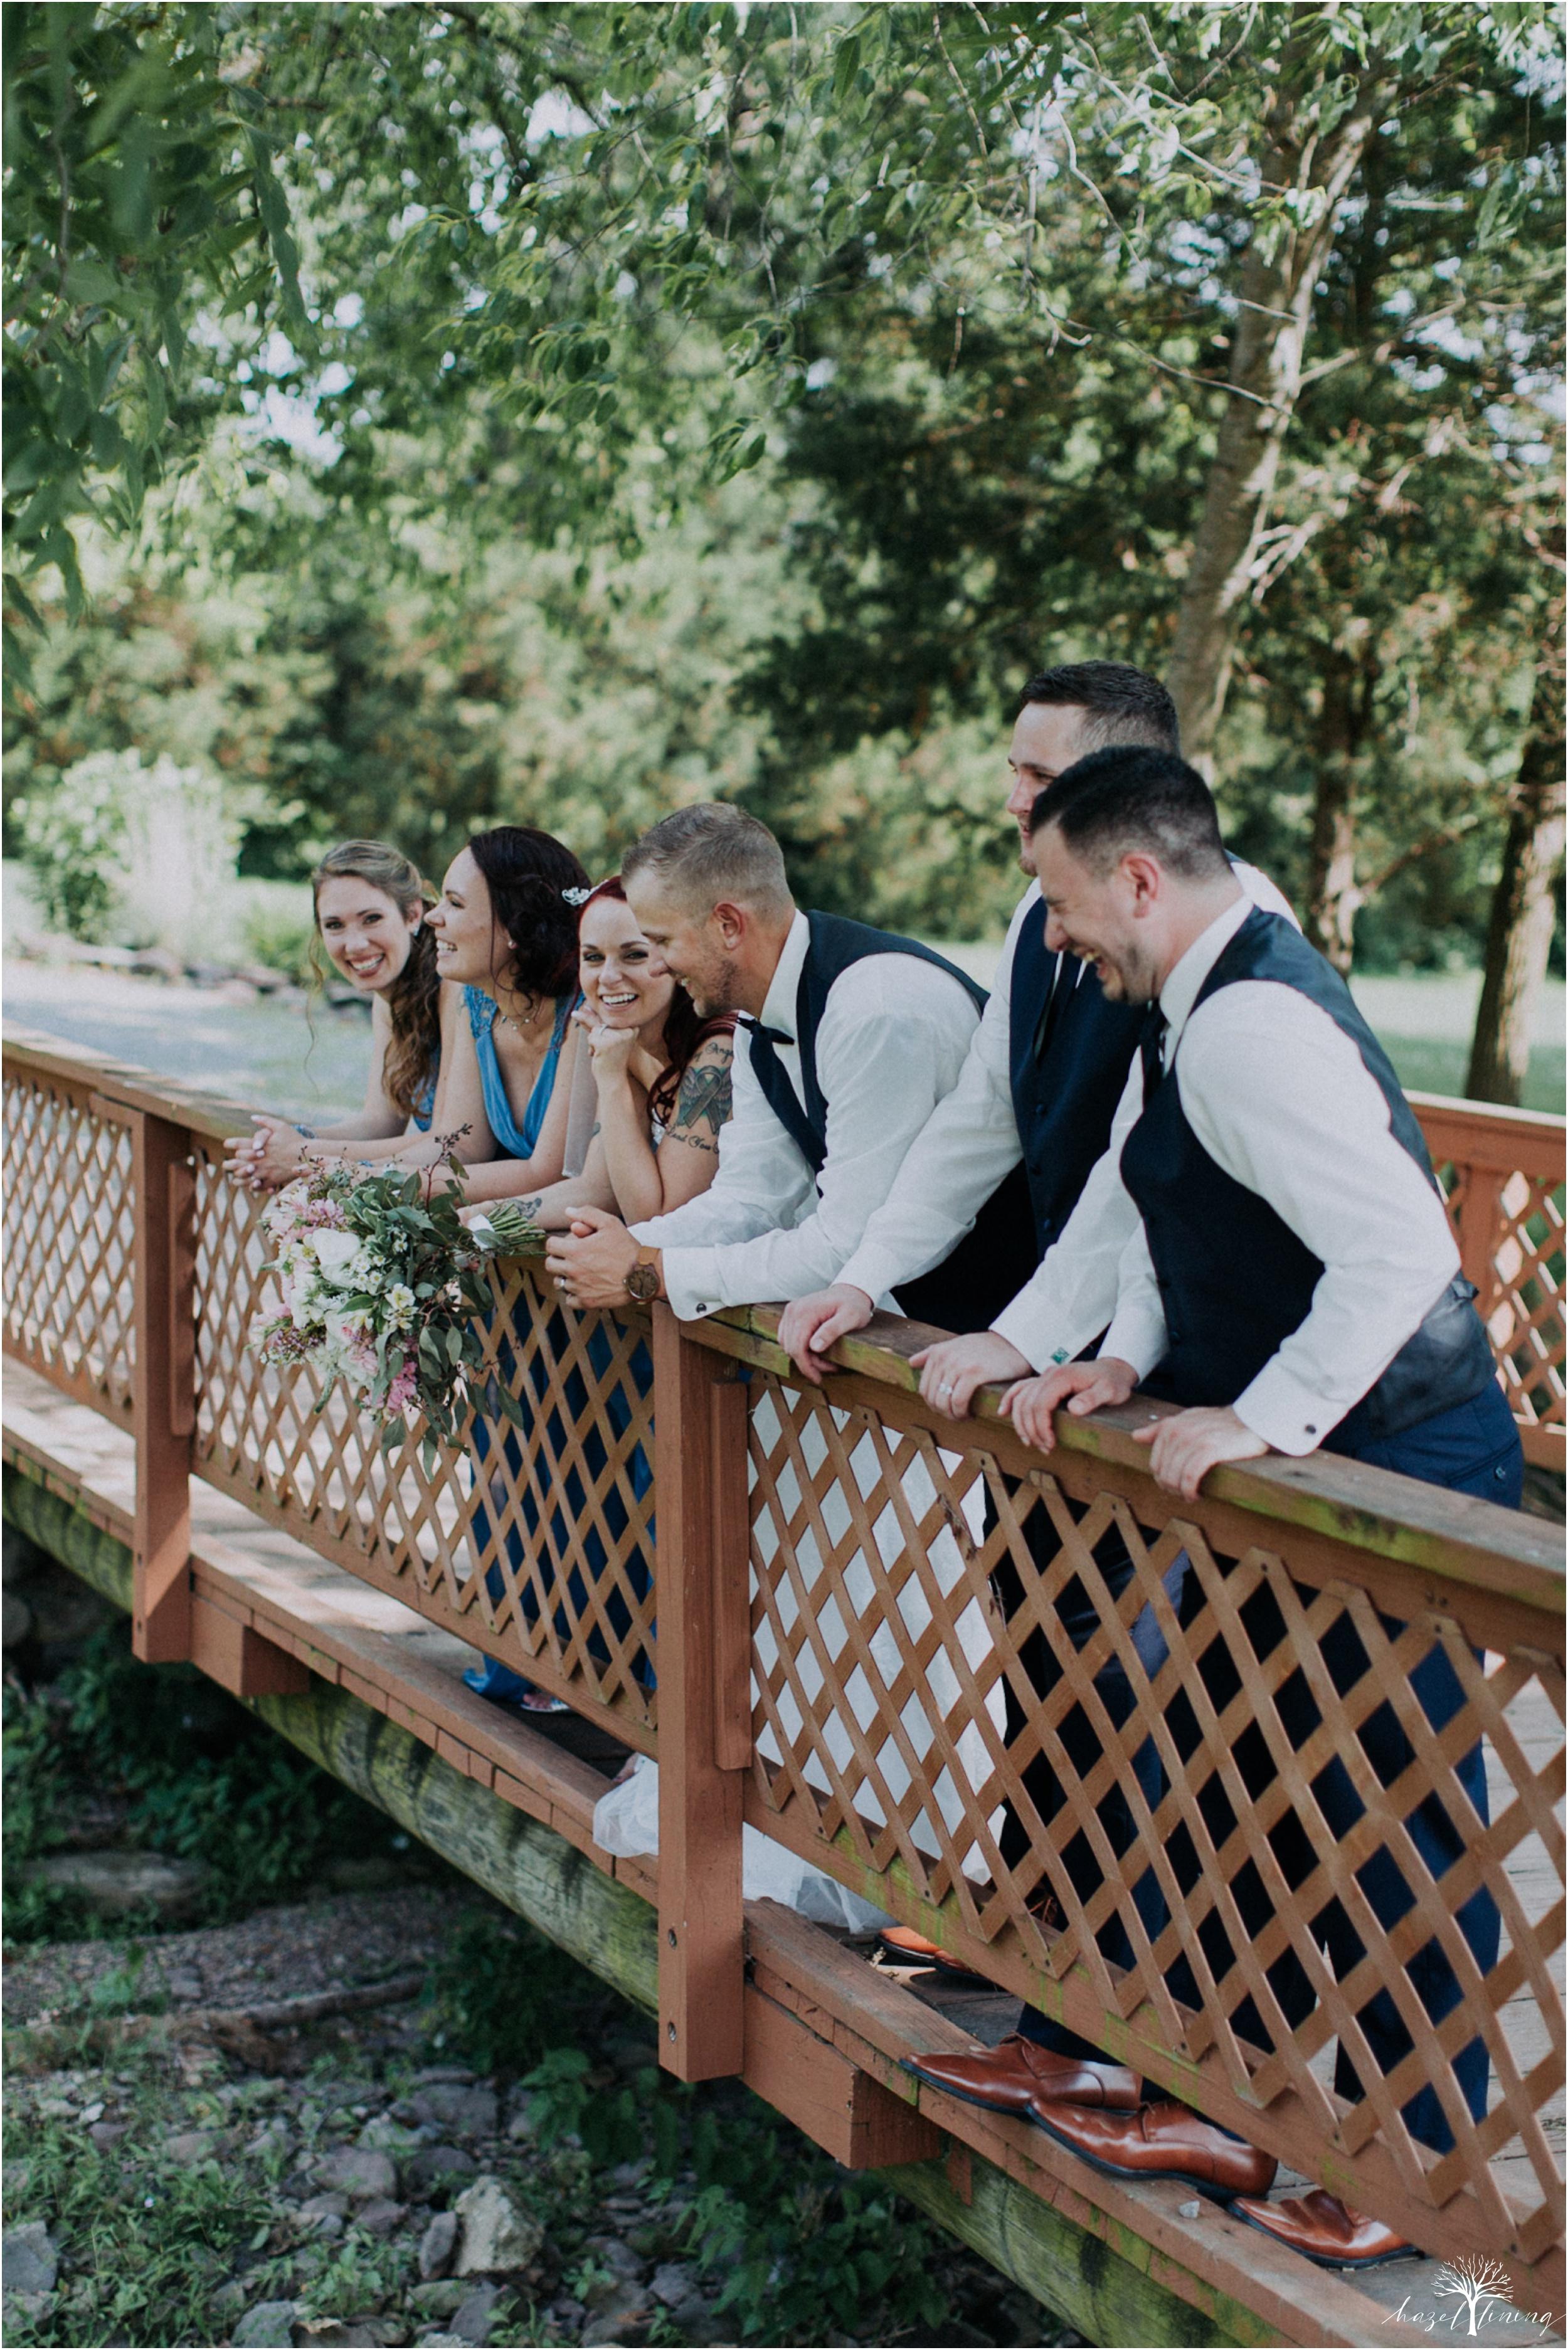 alyssa-james-stiteler-wedding-loft-and-sweet-water-cc-pennsburg-pennsylvania-hazel-lining-travel-wedding-elopement-photography_0080.jpg